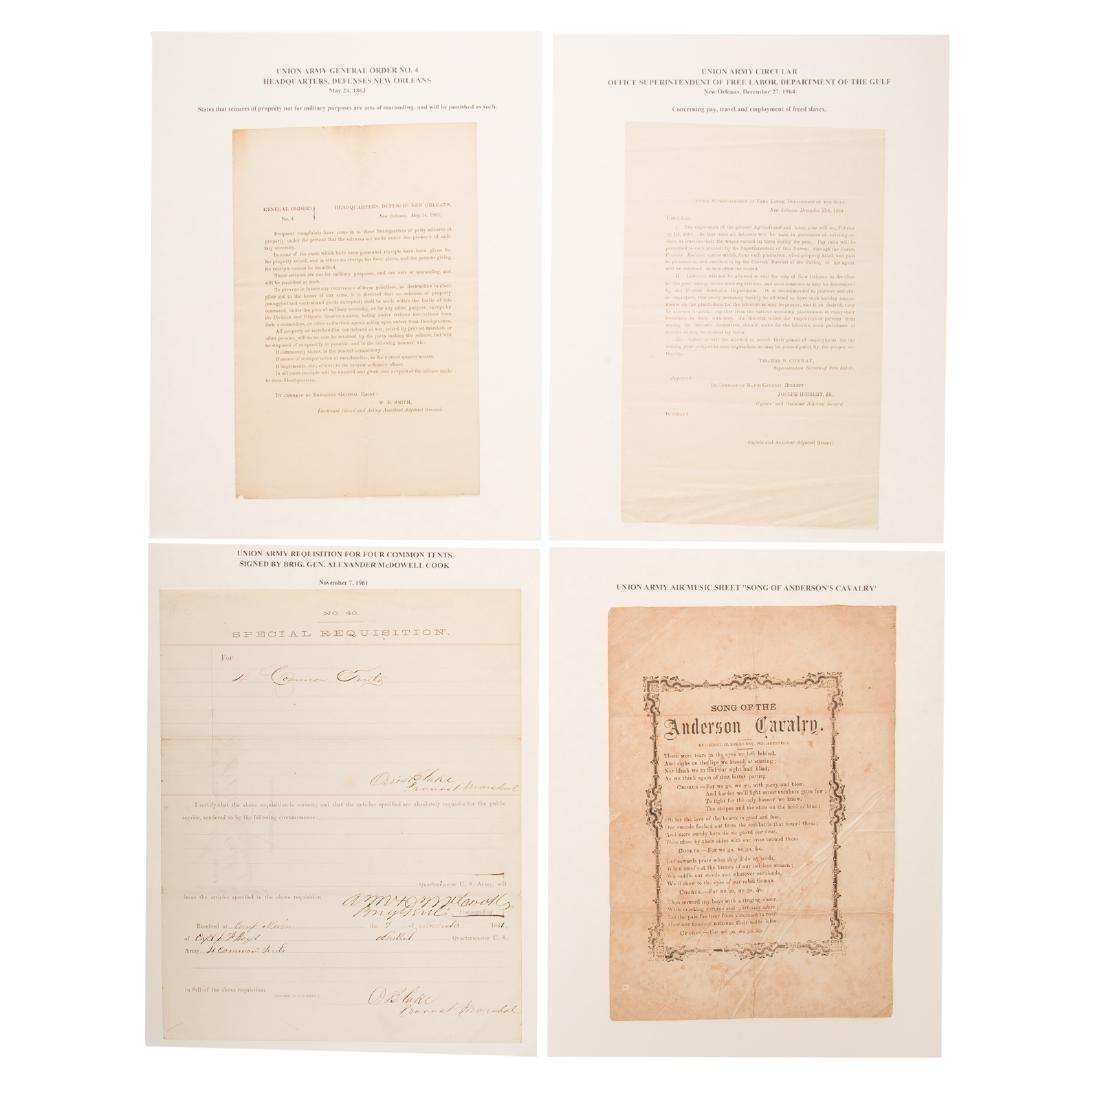 [US] Three Interesting Union Army documents